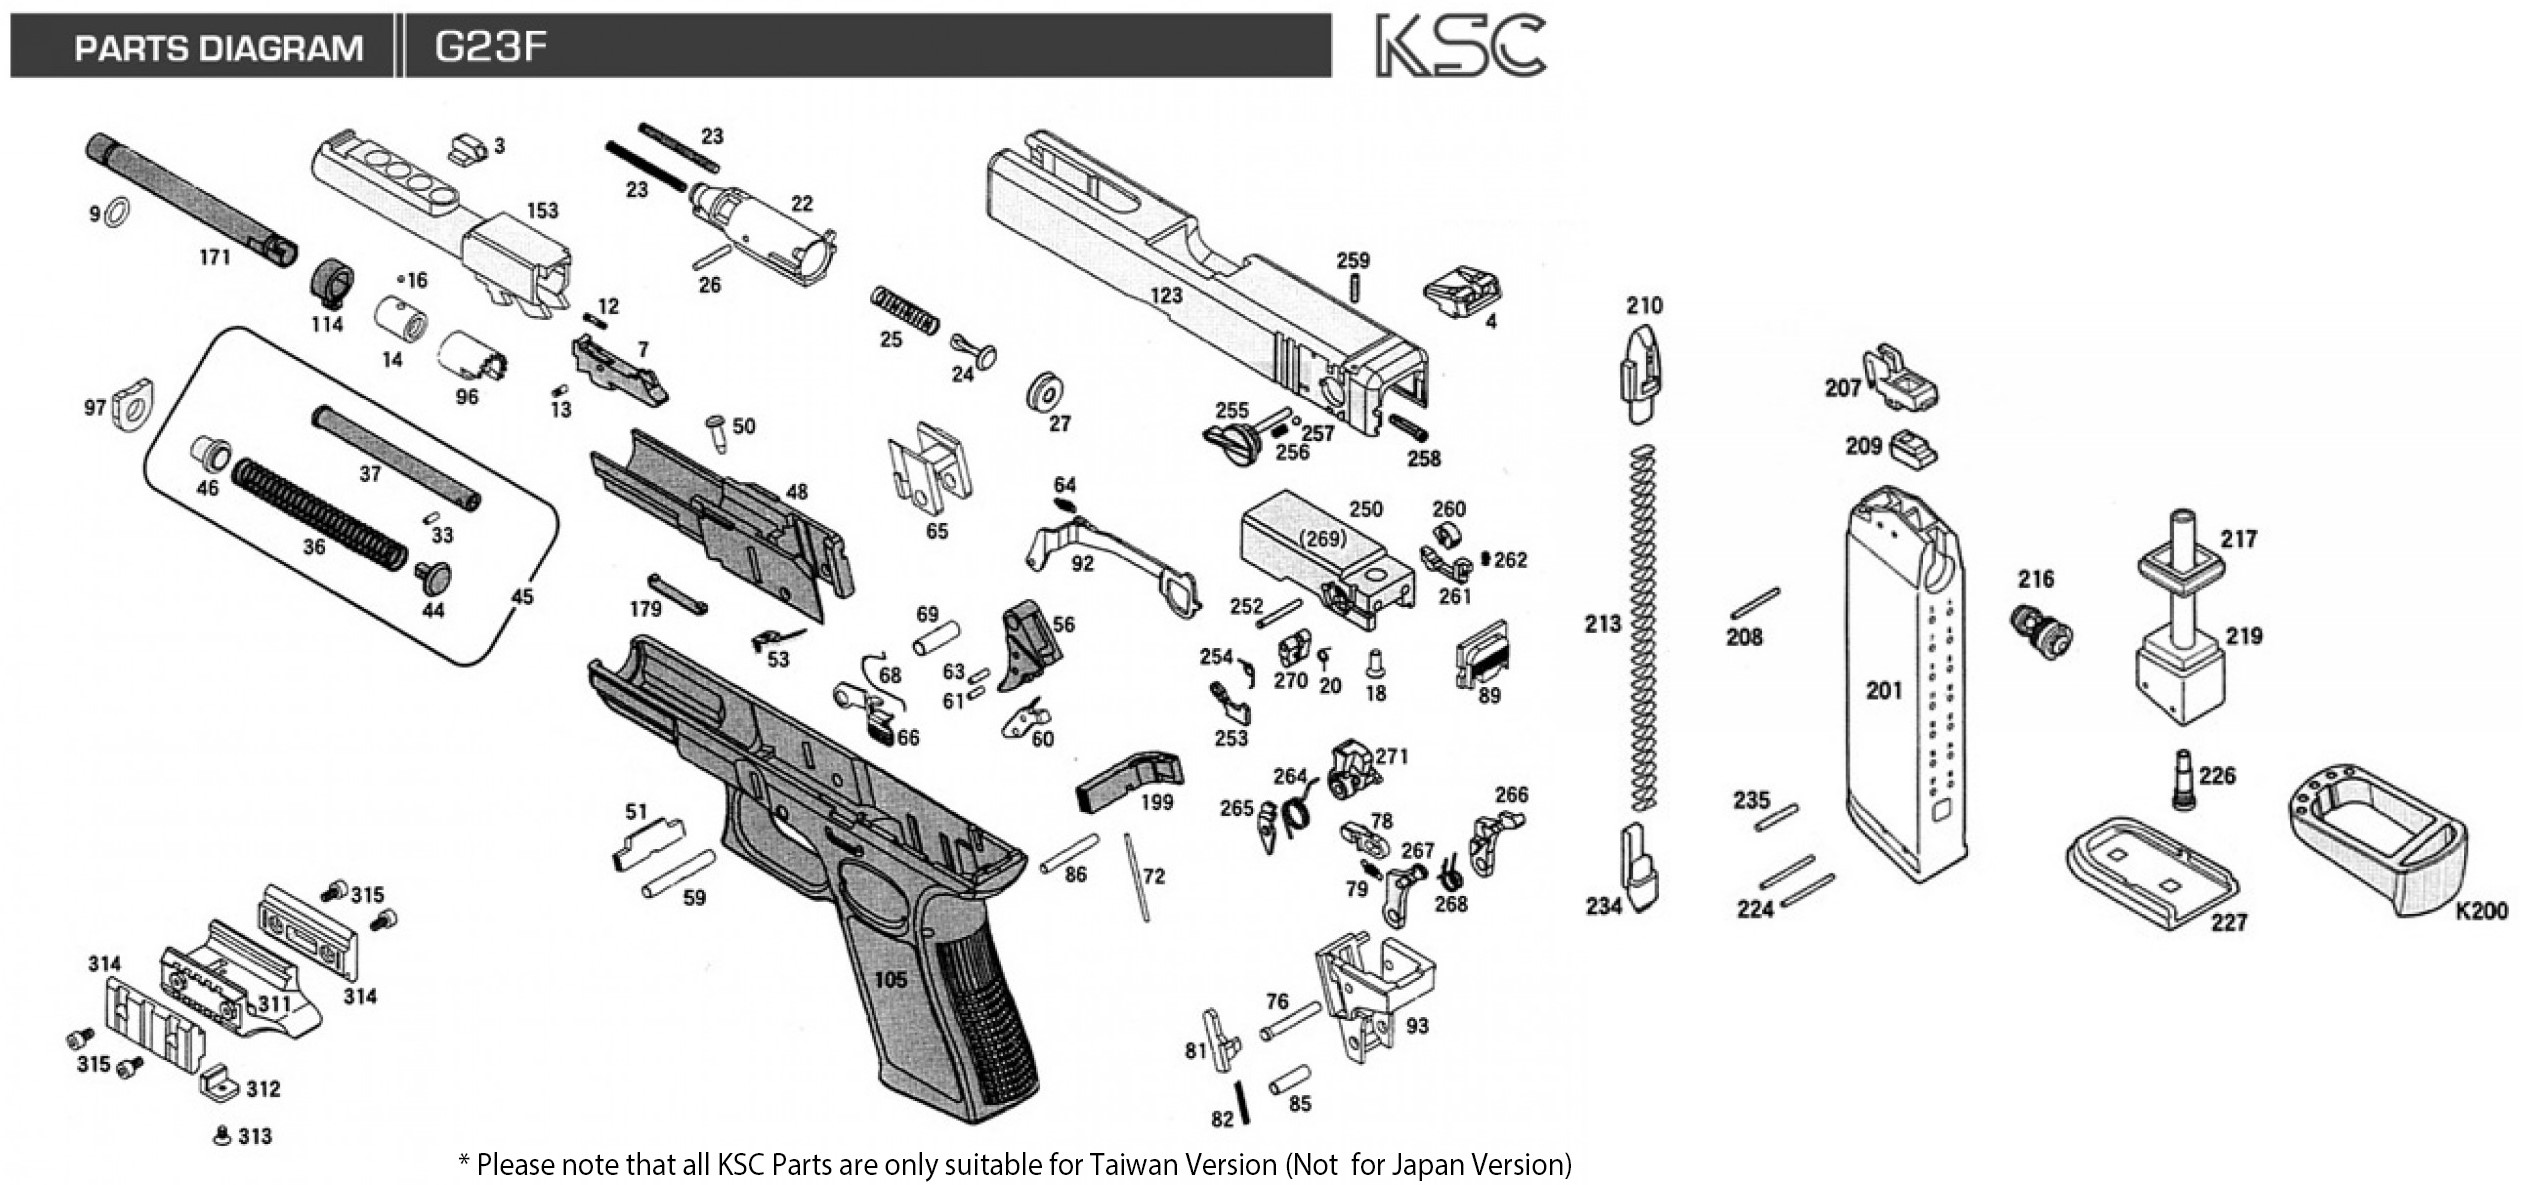 Exploded Diagram Ksc Glock 23f Ksc Part Original